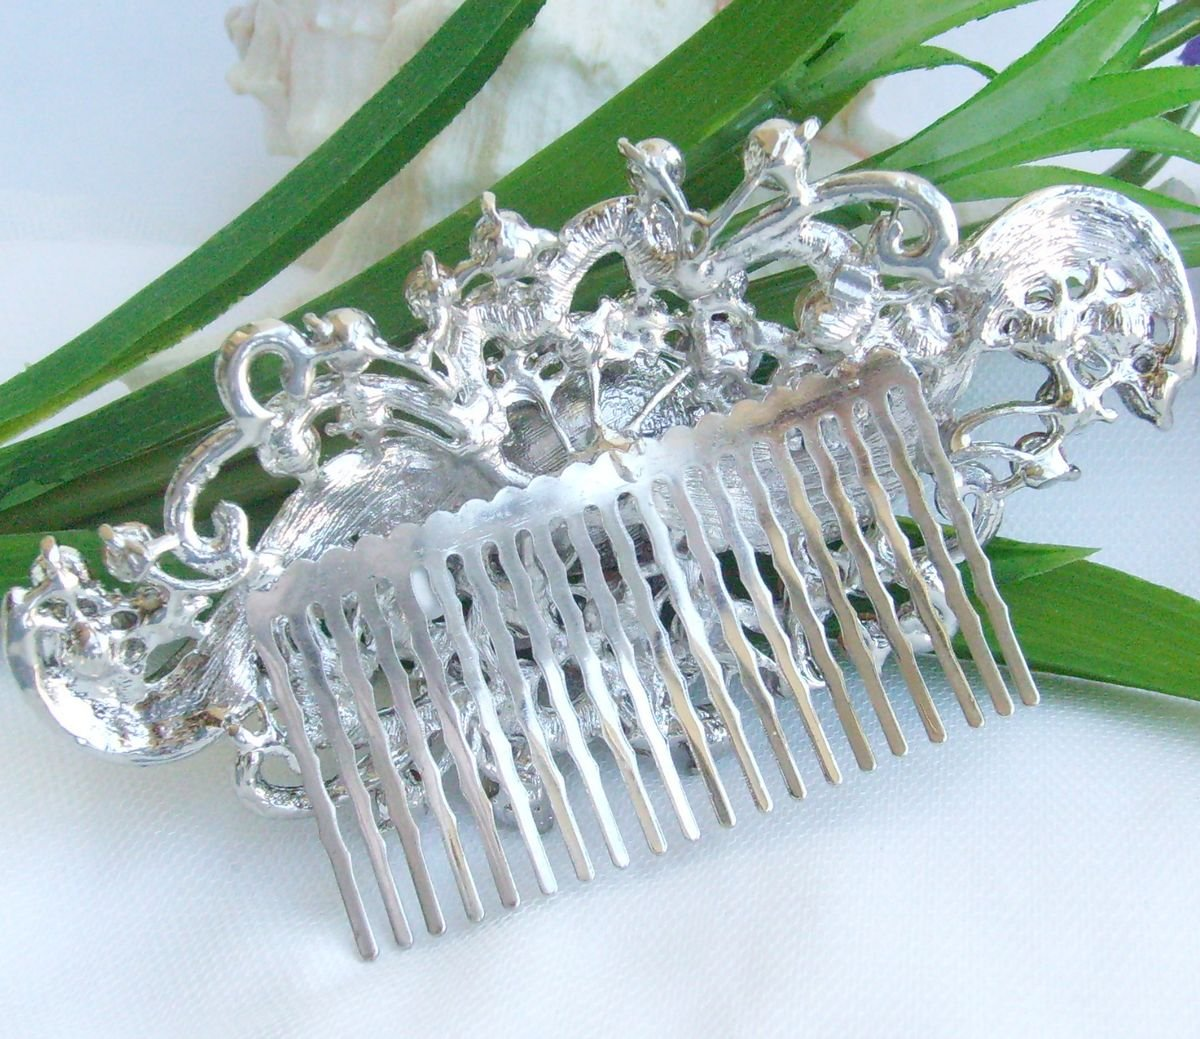 Sindary Wedding Headpiece 4.53 Inch Silver-tone Clear Rhinestone Crystal Flower Hair Comb by Sindary Jewelry (Image #6)